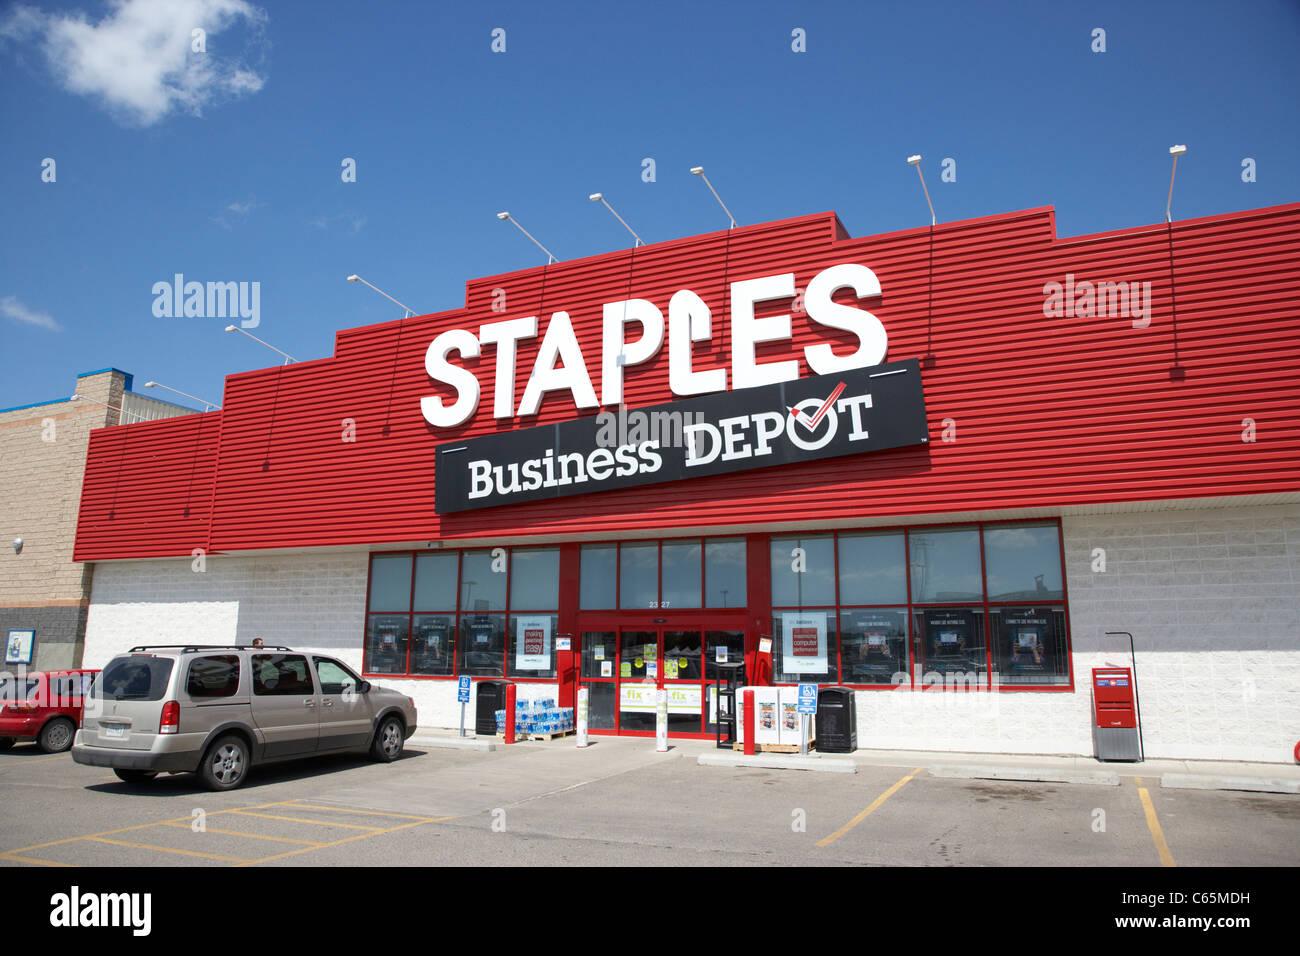 staples business depot retail store Saskatoon Saskatchewan Canada - Stock Image